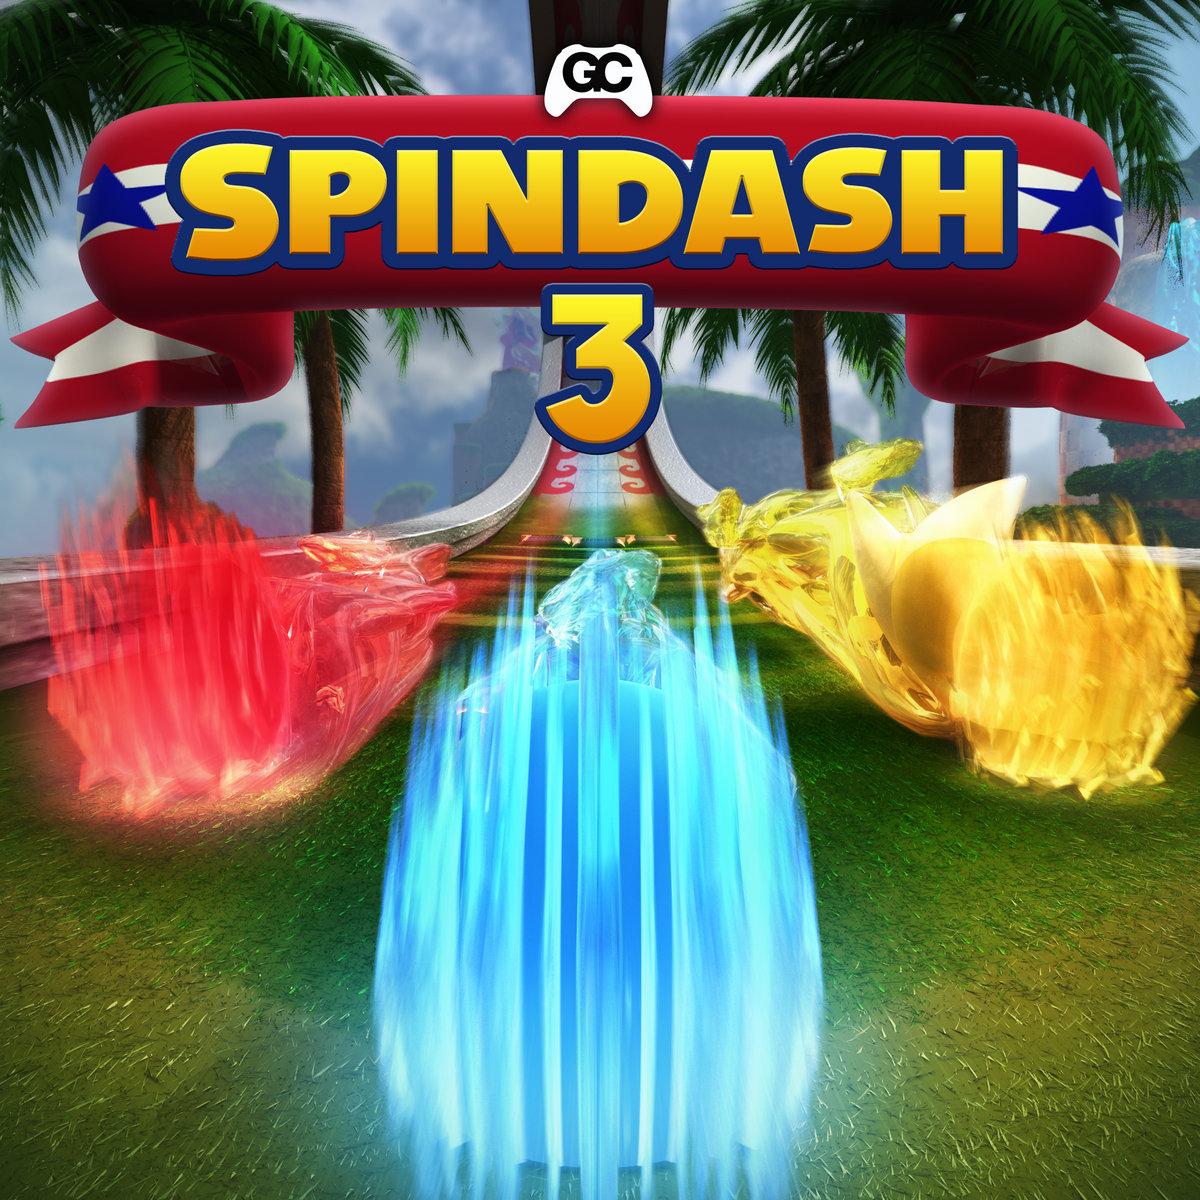 Spindash 3: Sonic the Hedgehog Remixes | GameChops